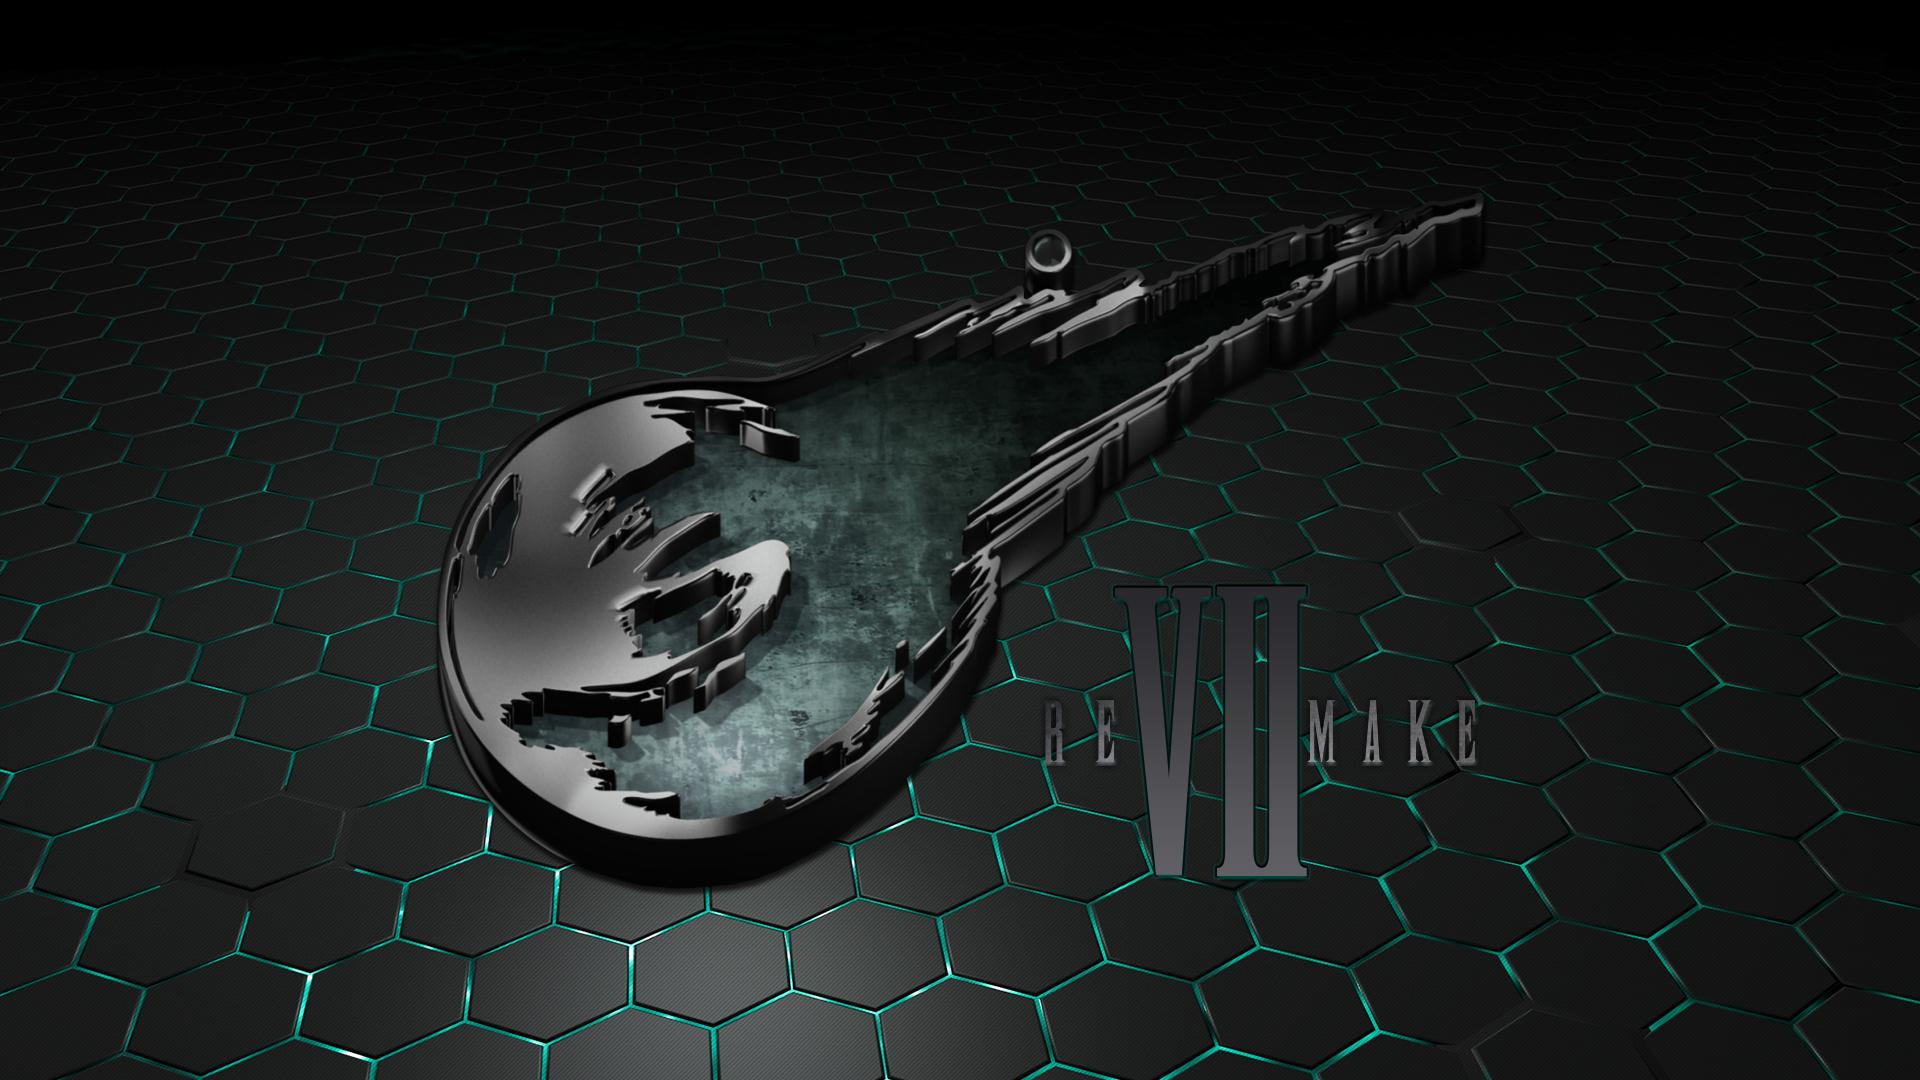 Final Fantasy Vii Remake Logo Wallpaper By Seraharcana On Deviantart